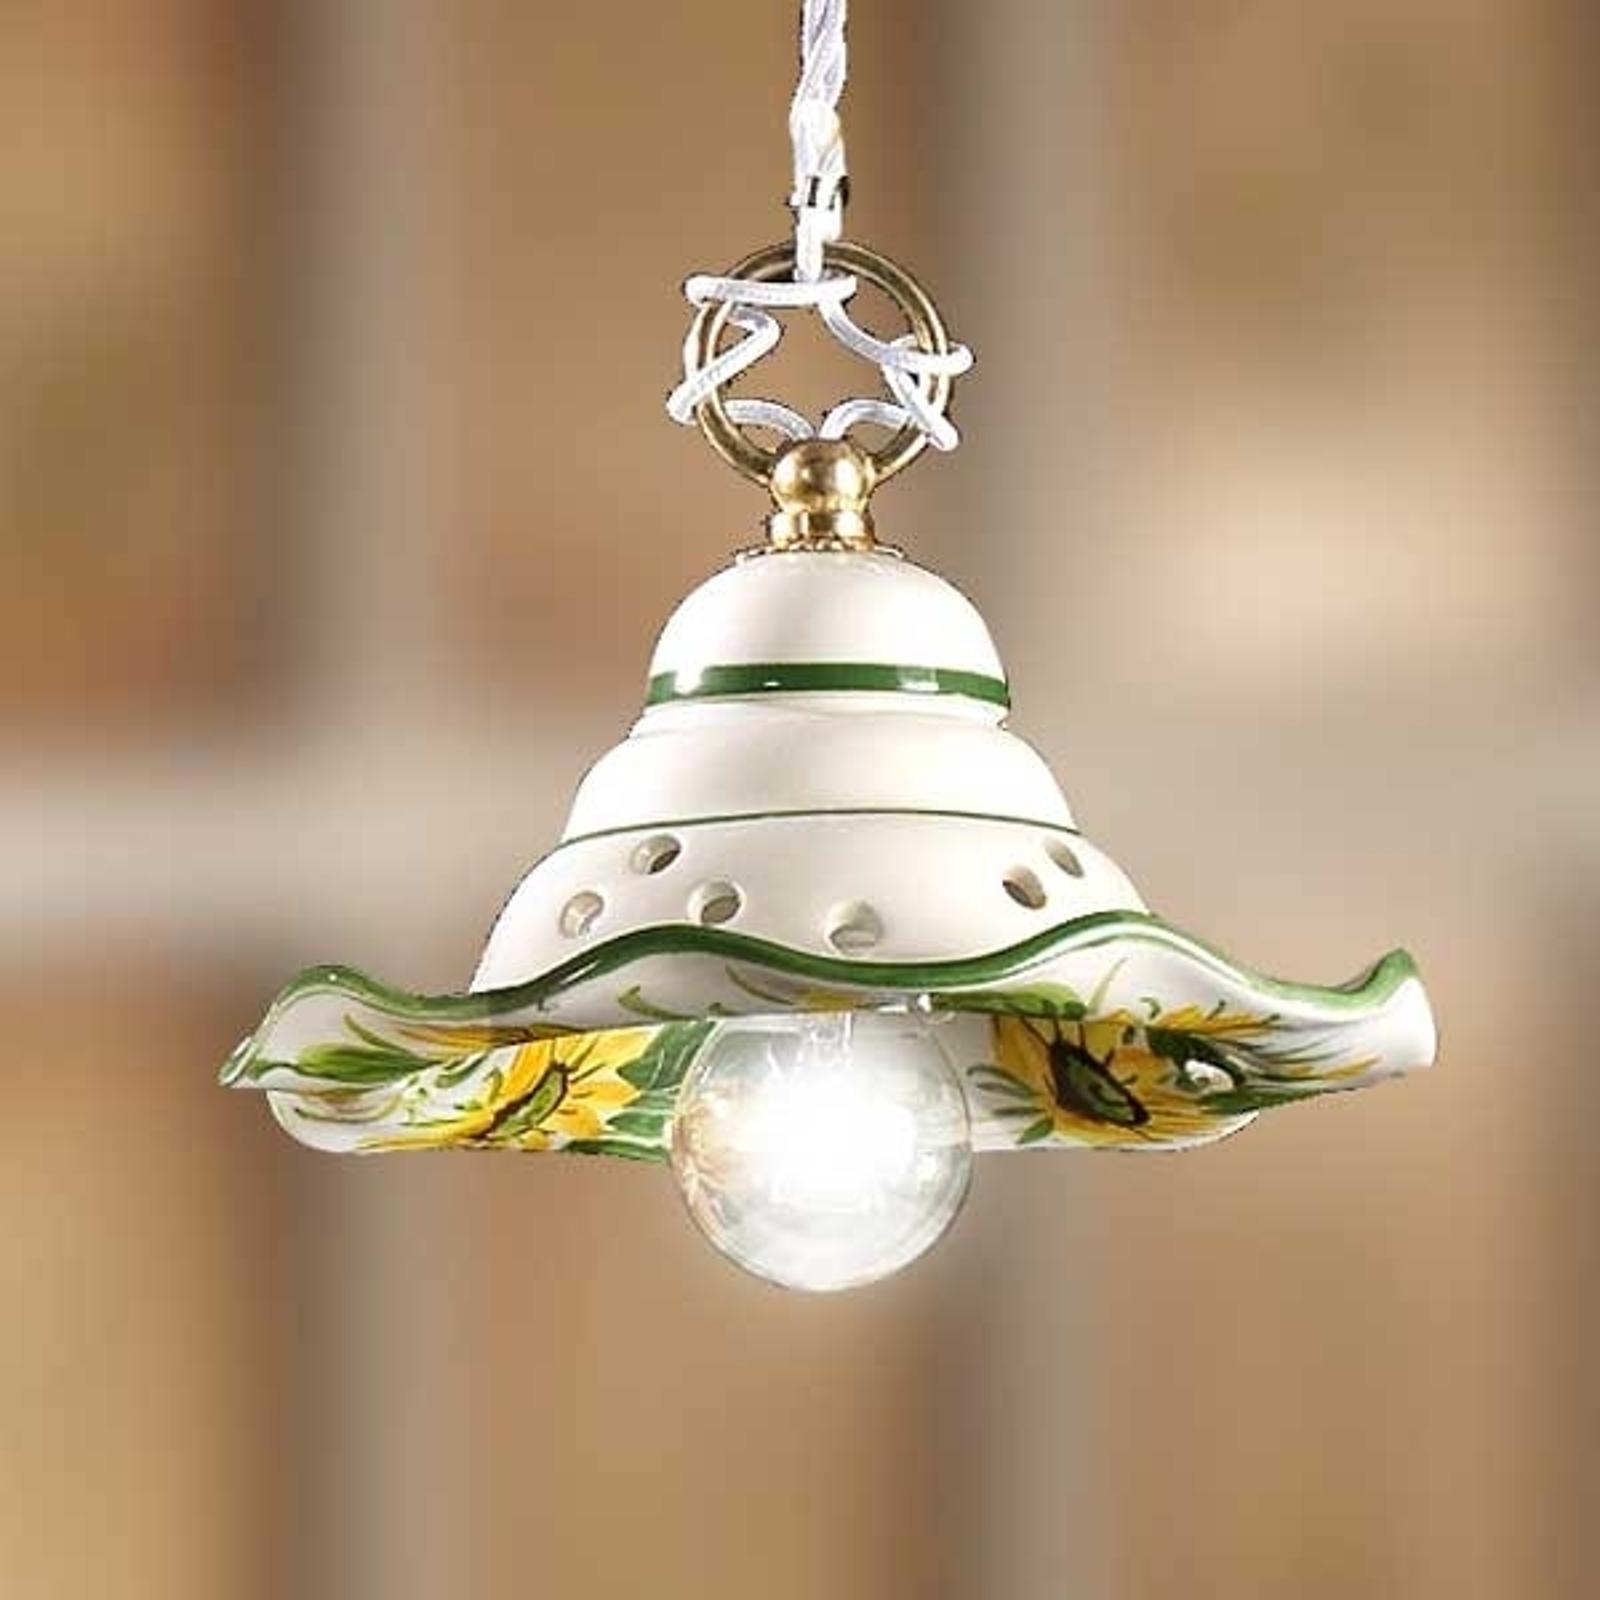 Pequeña lámpara colgante GIRASOLA estilo rústico